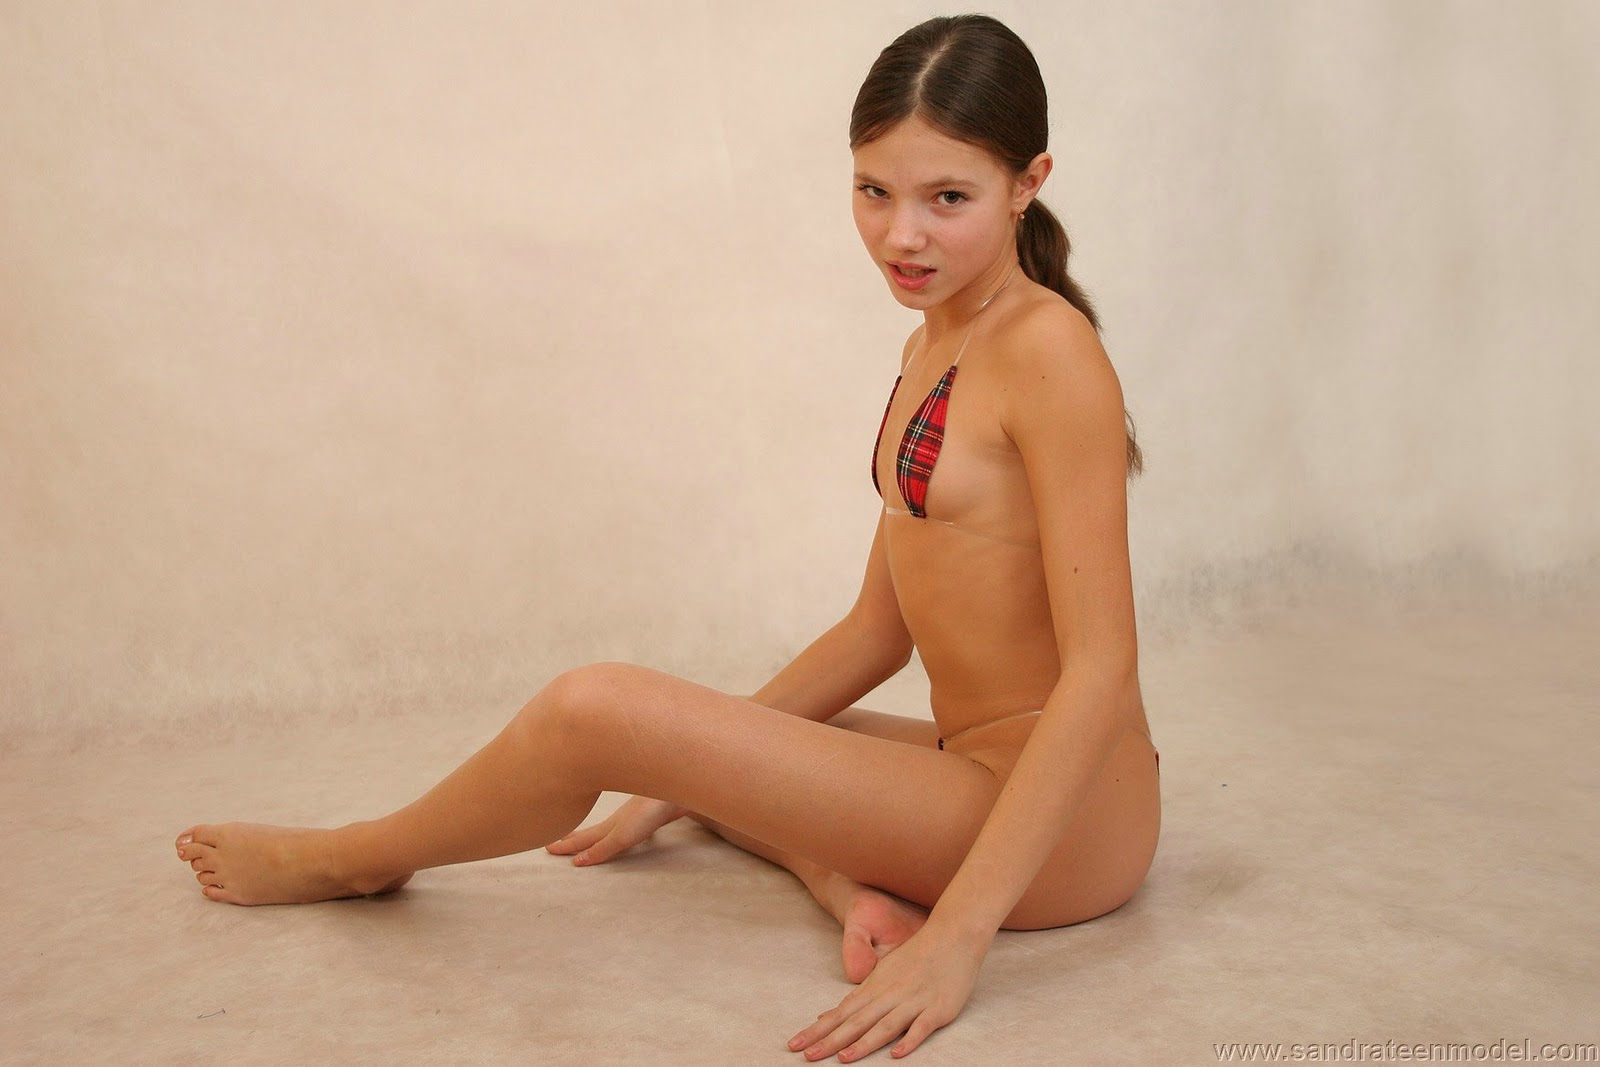 Early Sandra Orlow Model Nude